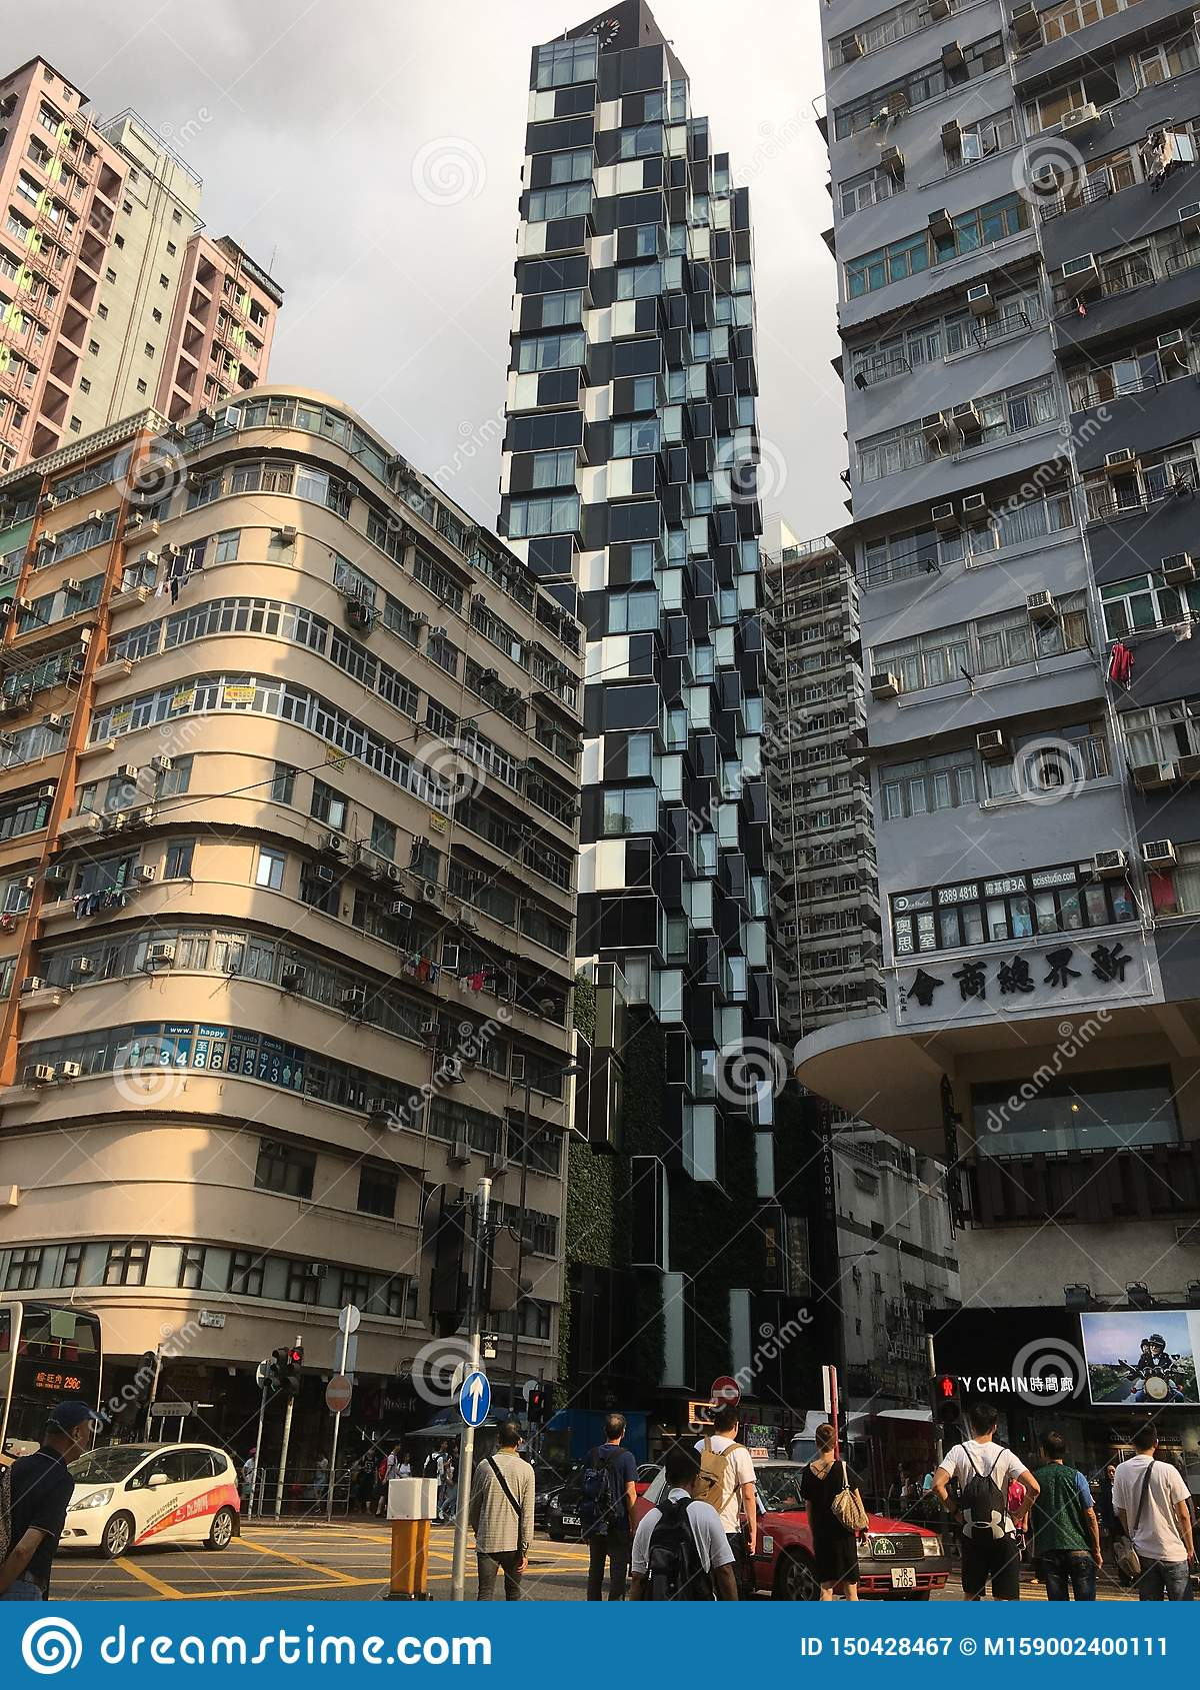 Street View of Hong Kong